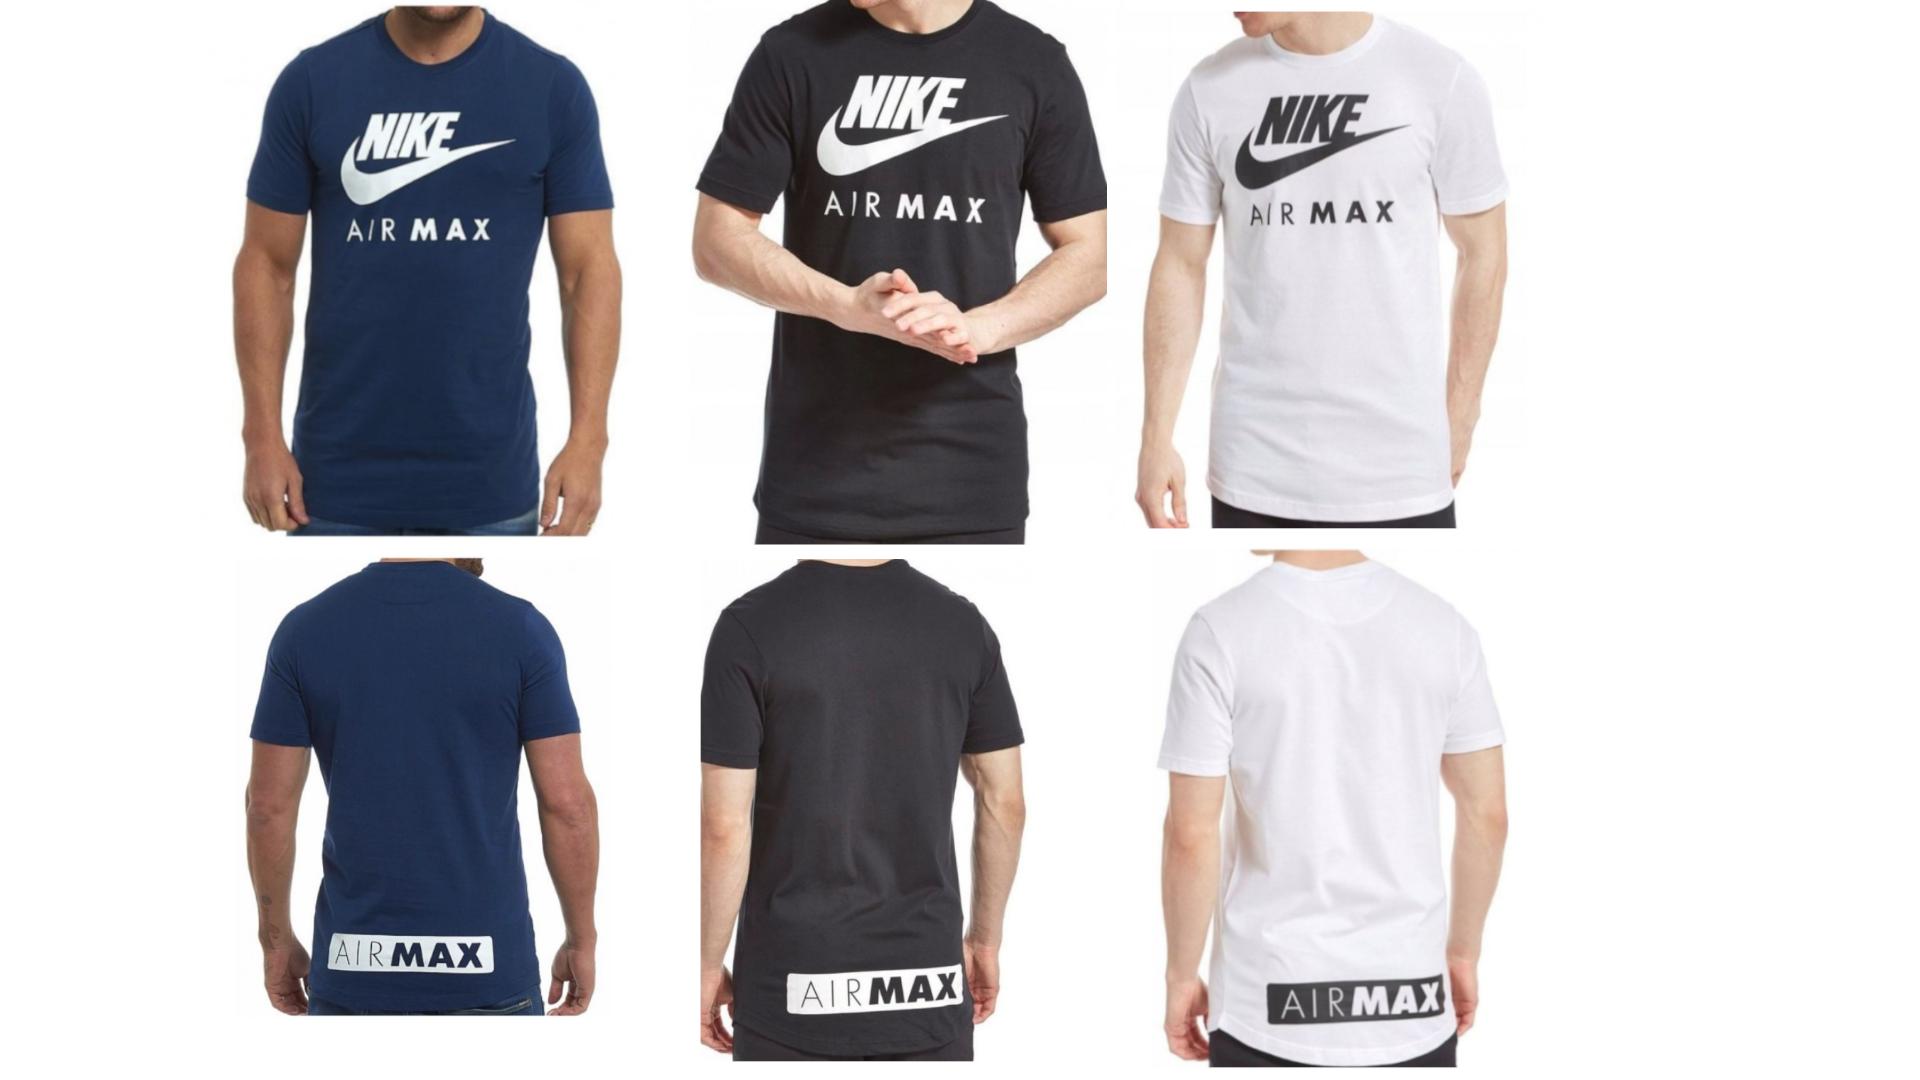 Nike Air Max Herren Sport T Shirt Blau Schwarz Weiß S M L XL